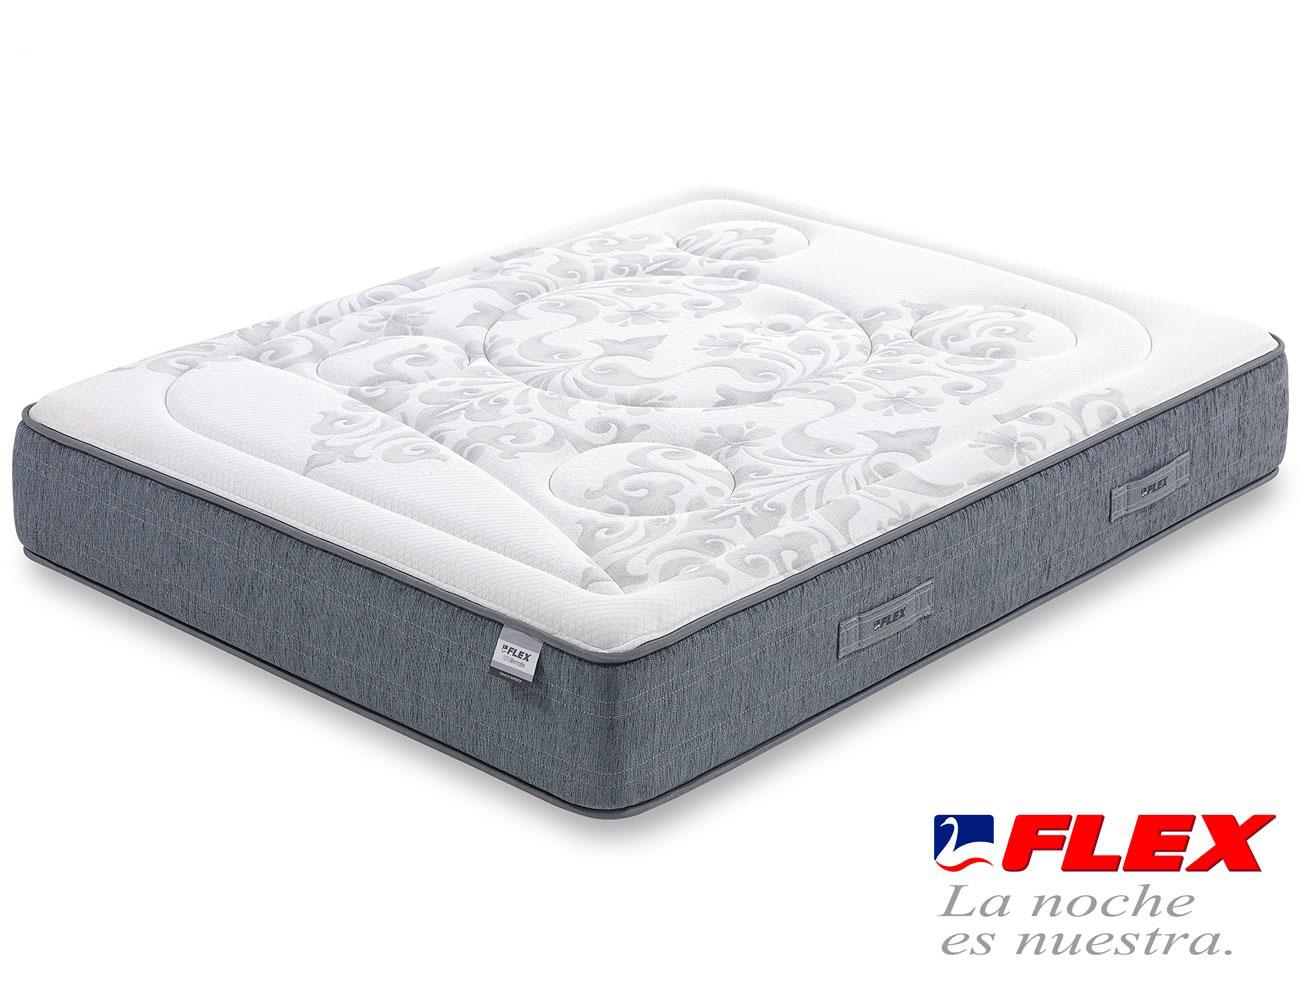 Colchon flex airvex viscoelastica gel garbi superior9